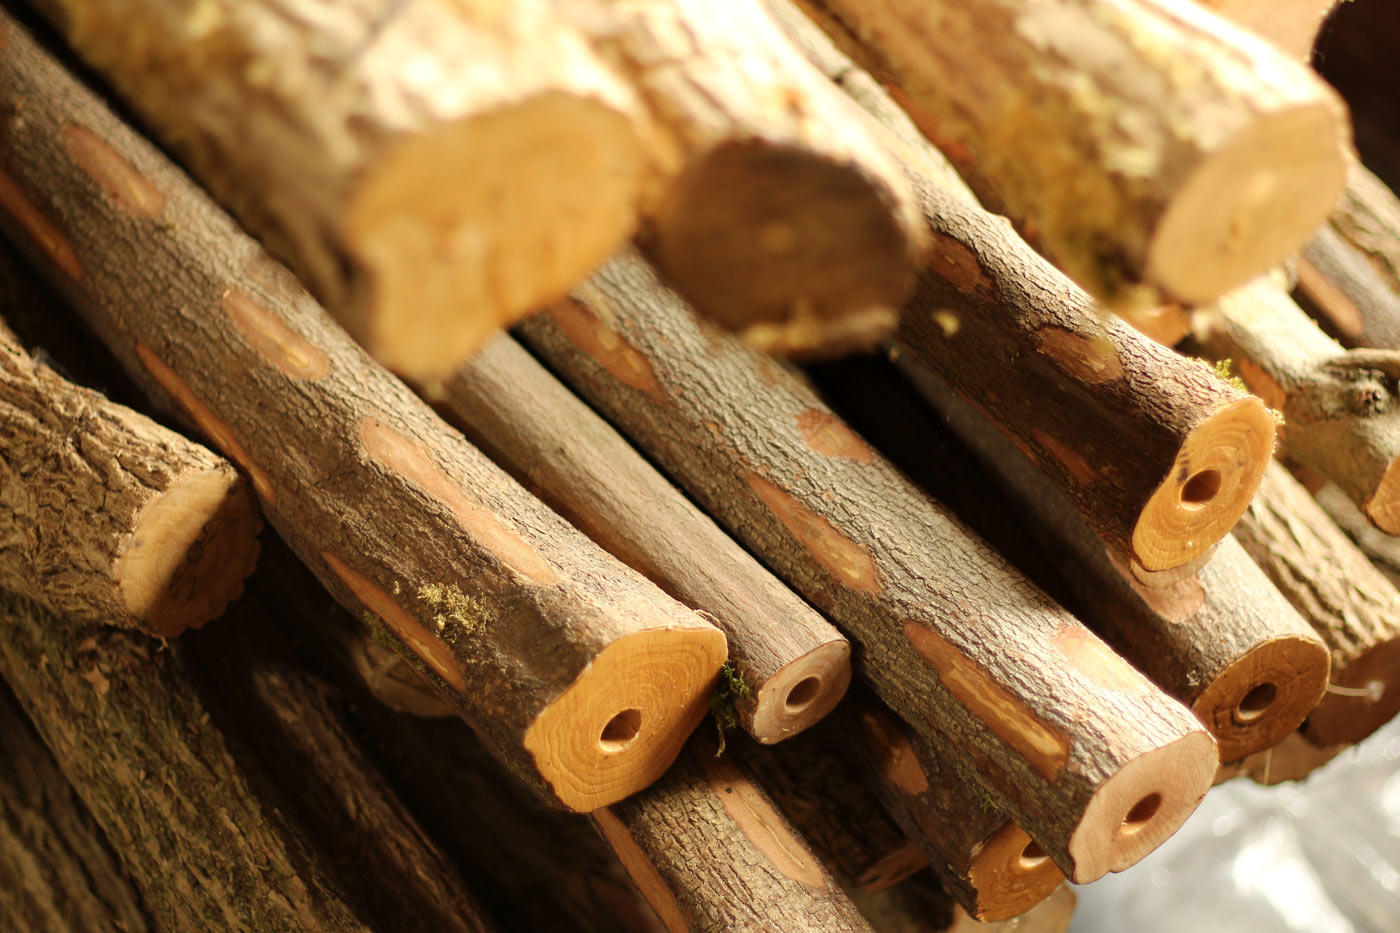 Dogwood and Eldertrunks for future fujara making...